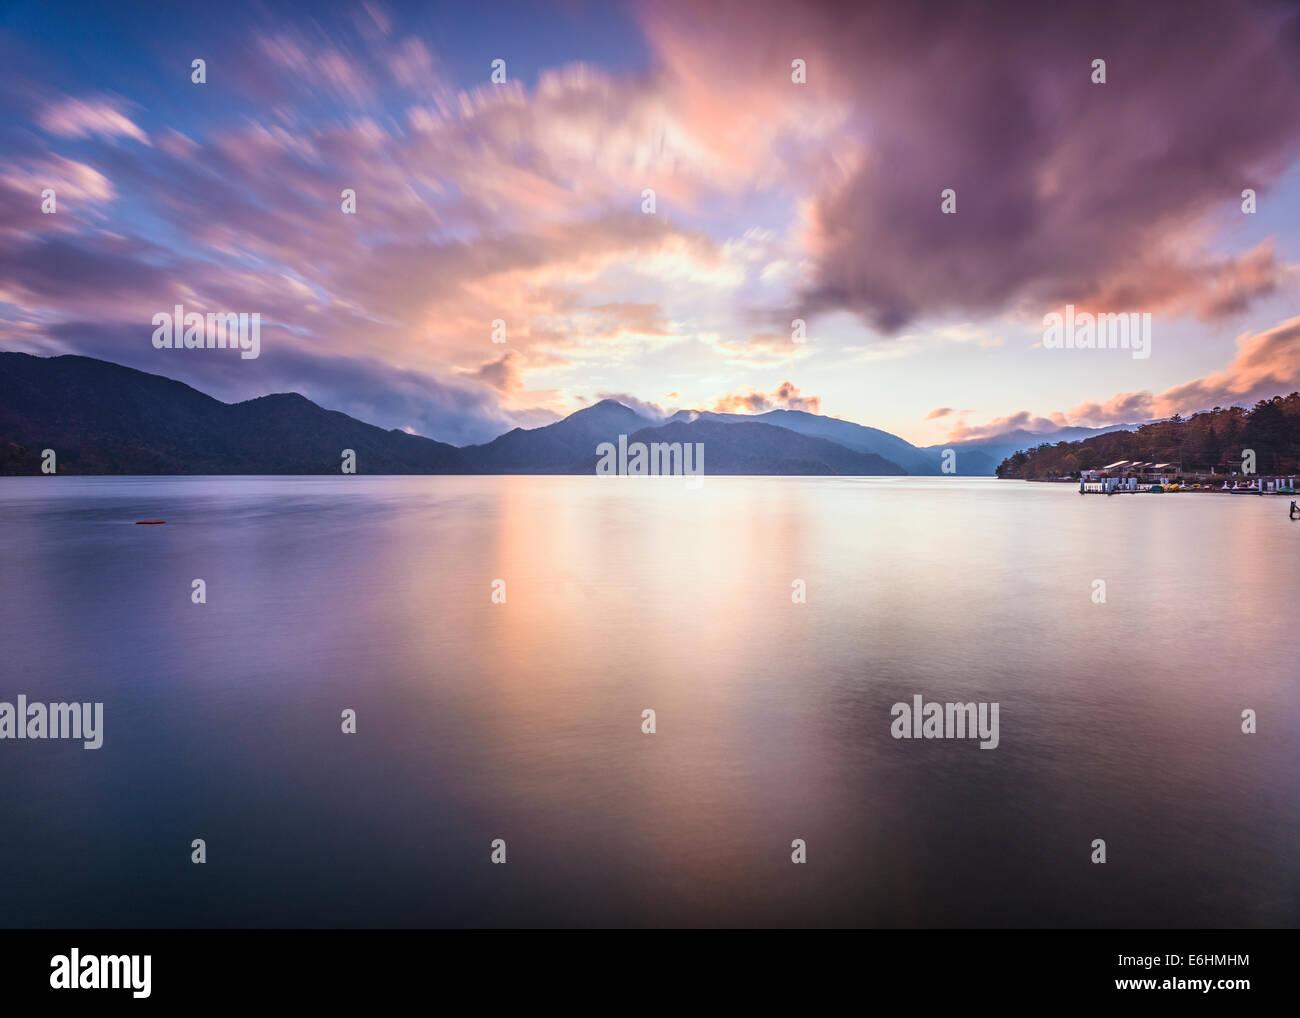 Il Lago Chuzenji in Nikko, Giappone. Immagini Stock